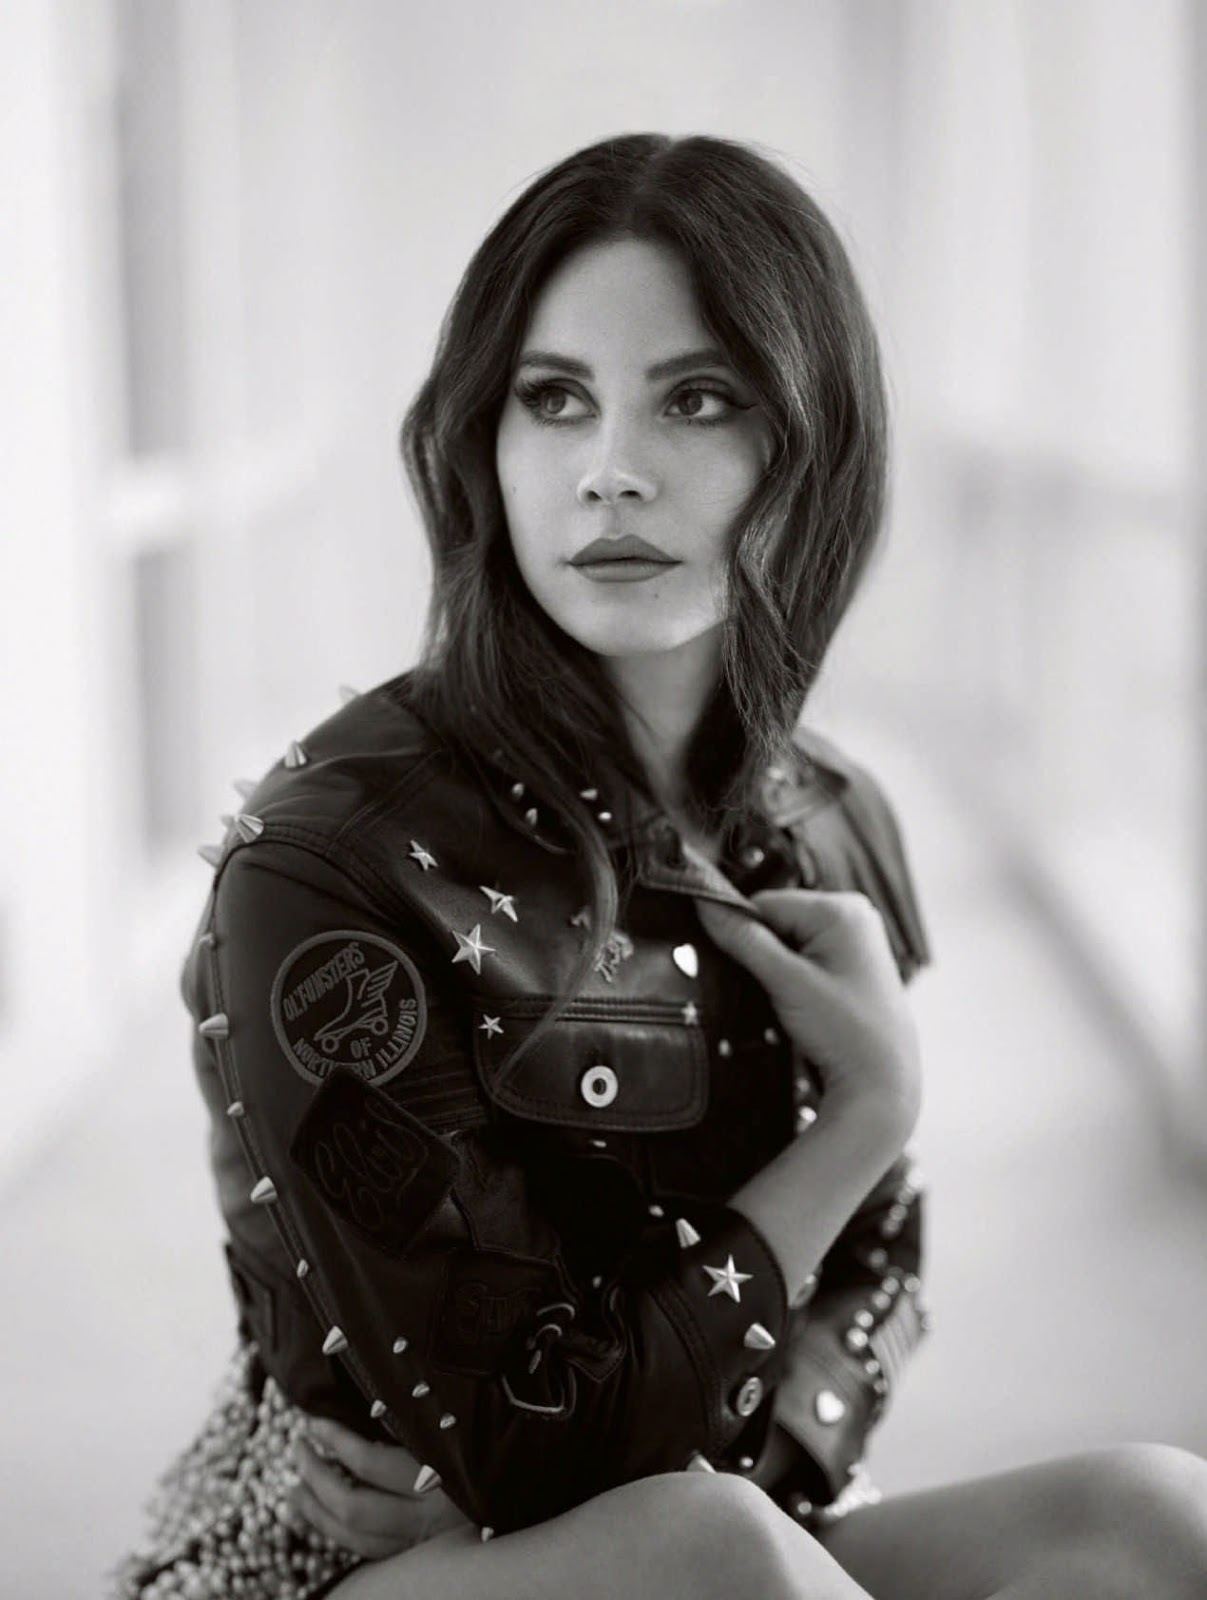 Lana Del Rey By Chris Nicholls For Fashion Magazine: Duchess Dior: Lana Del Rey By Thomas Whiteside For ELLE UK